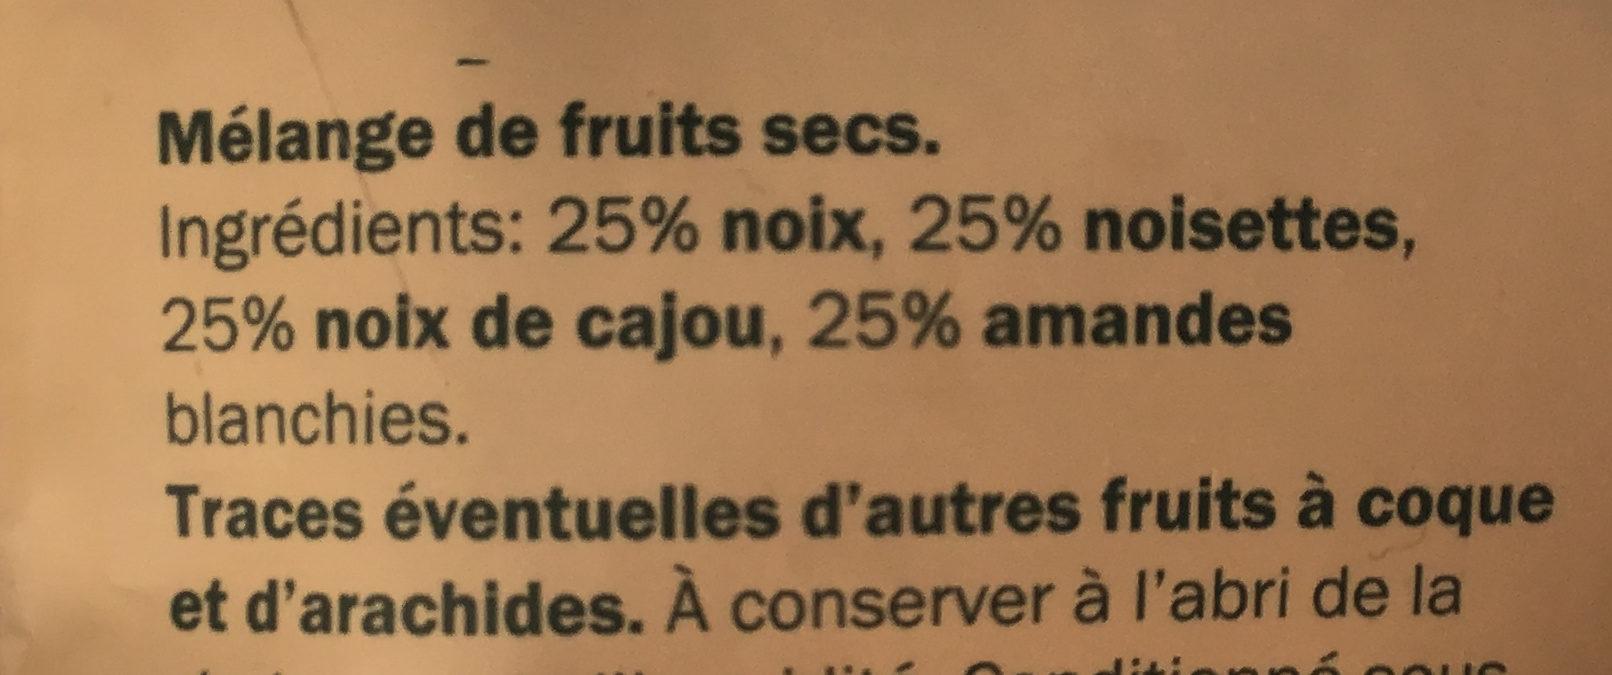 Mélange de fruits - Ingredients